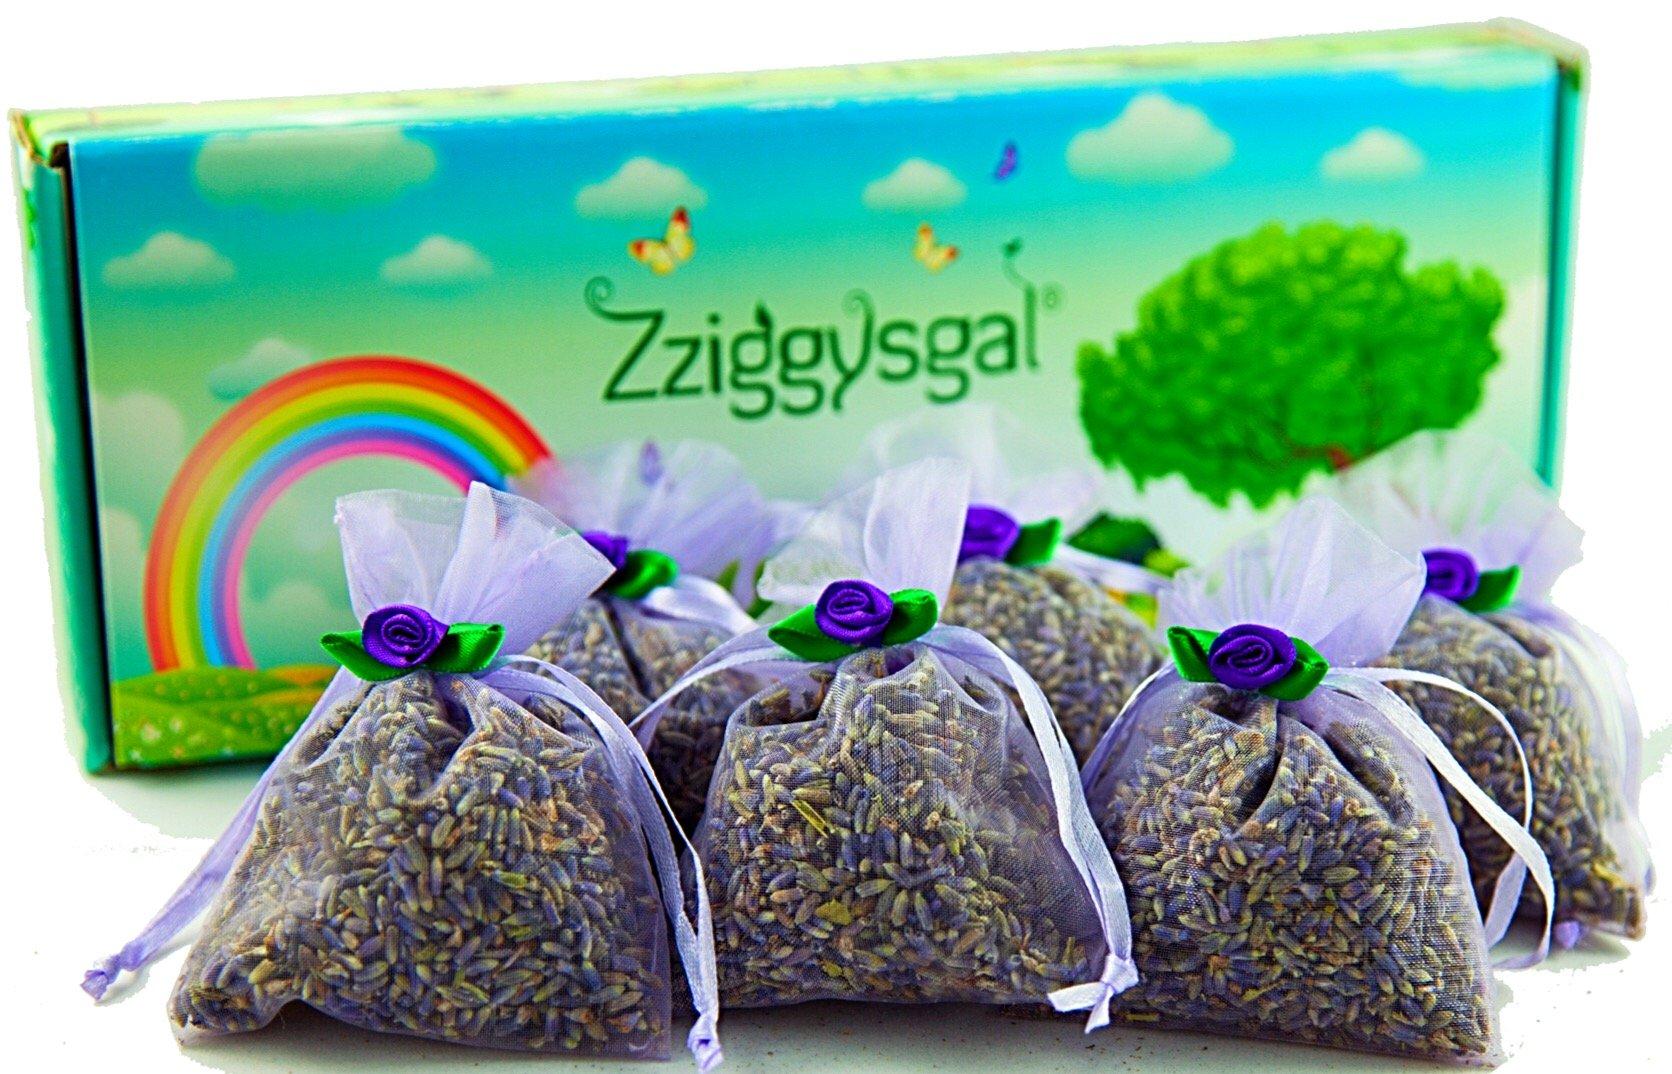 Zziggysgal 6 French Lavender Sachets in a Beautiful Keepsake Box (Lavender colored)